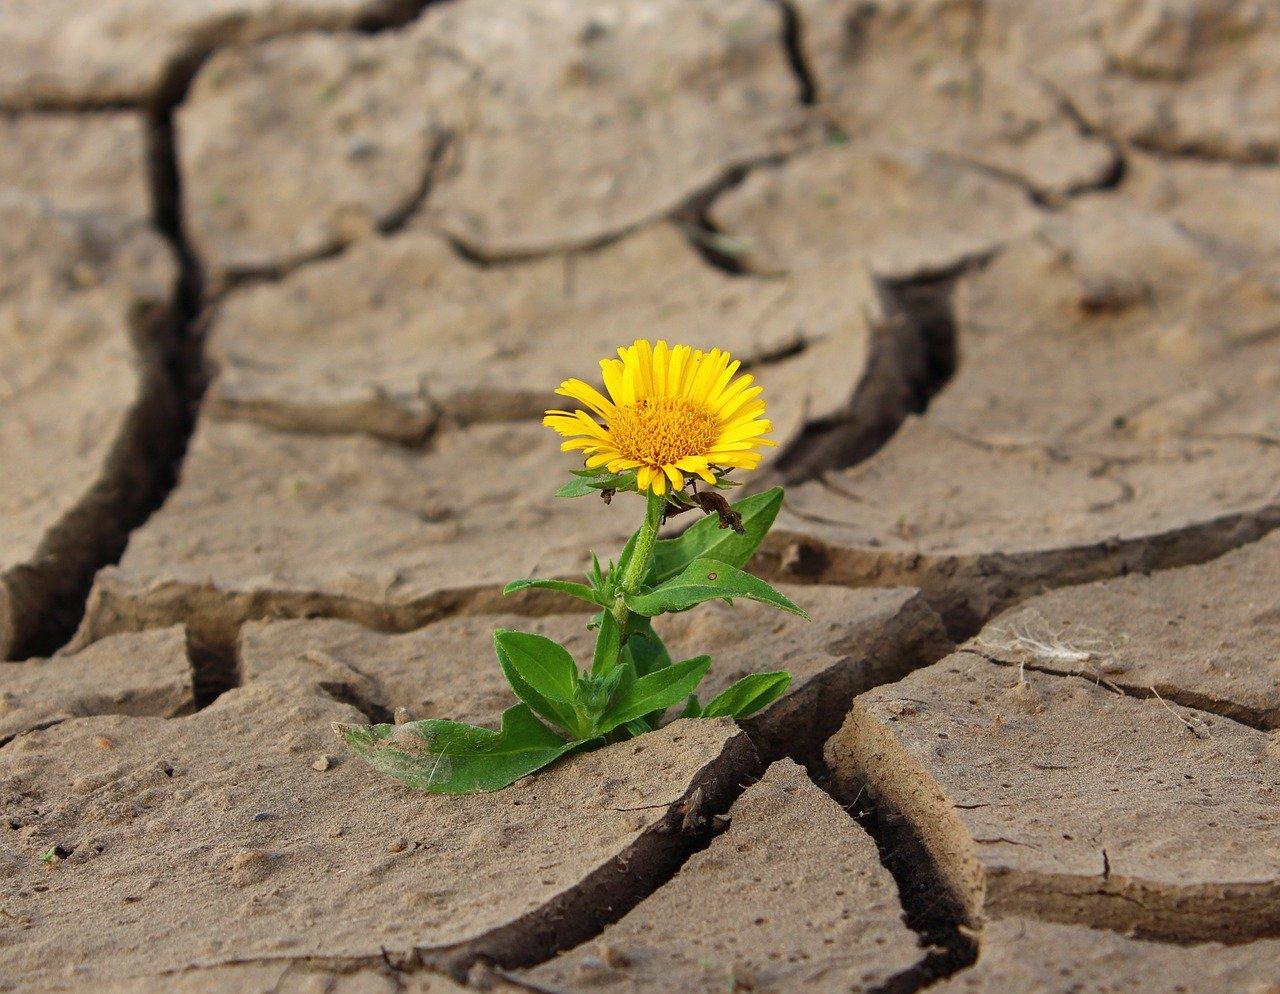 dandelion growing where ever it lands